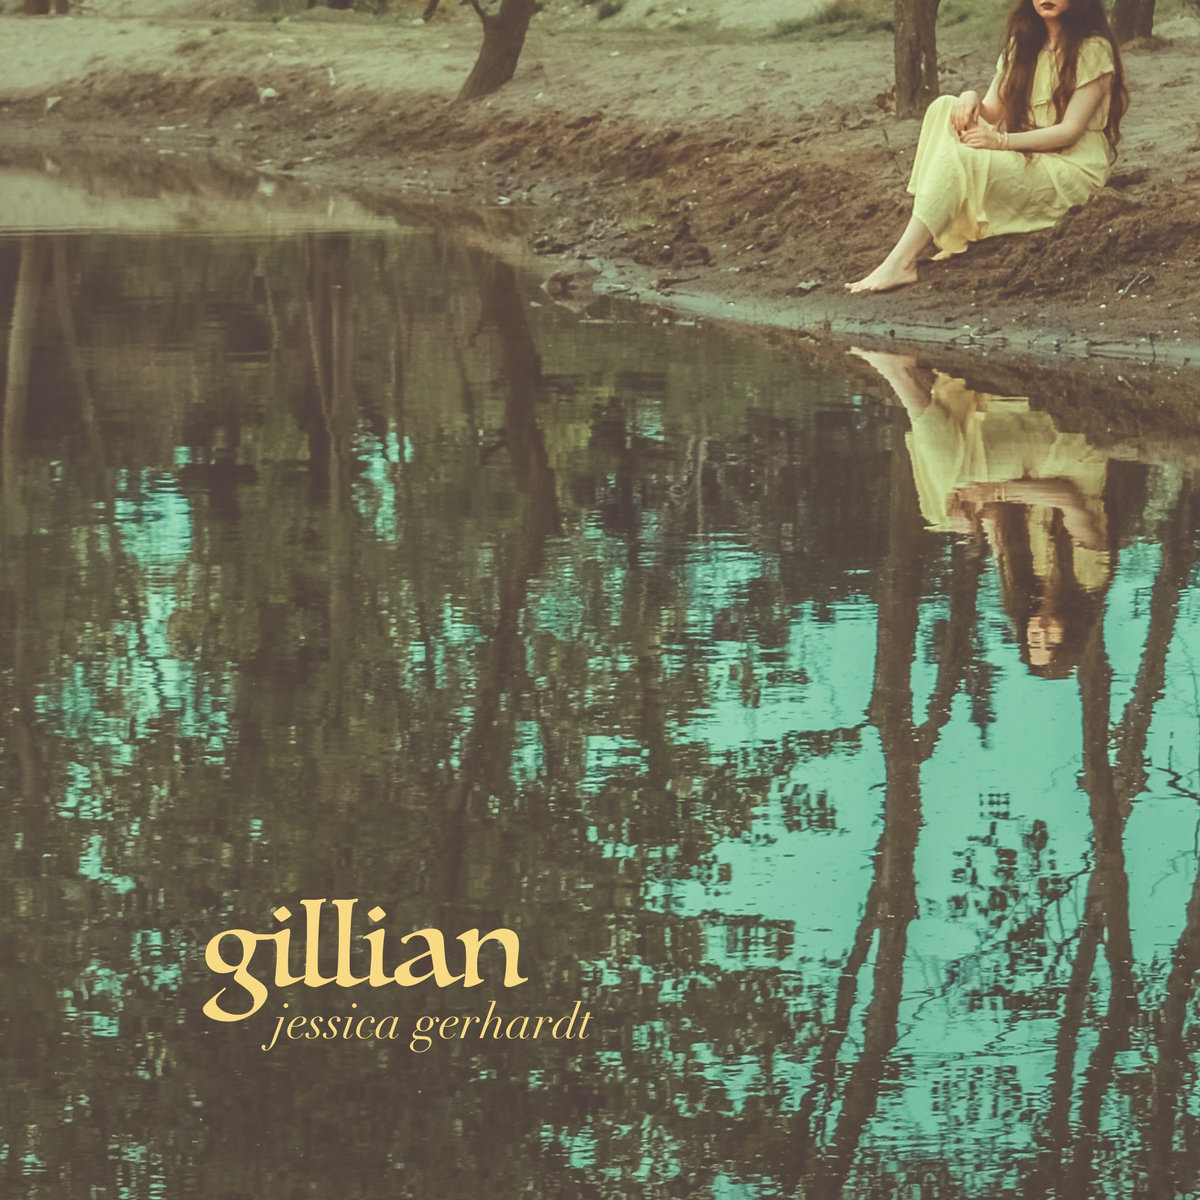 Gillian by Jessica Gerhardt